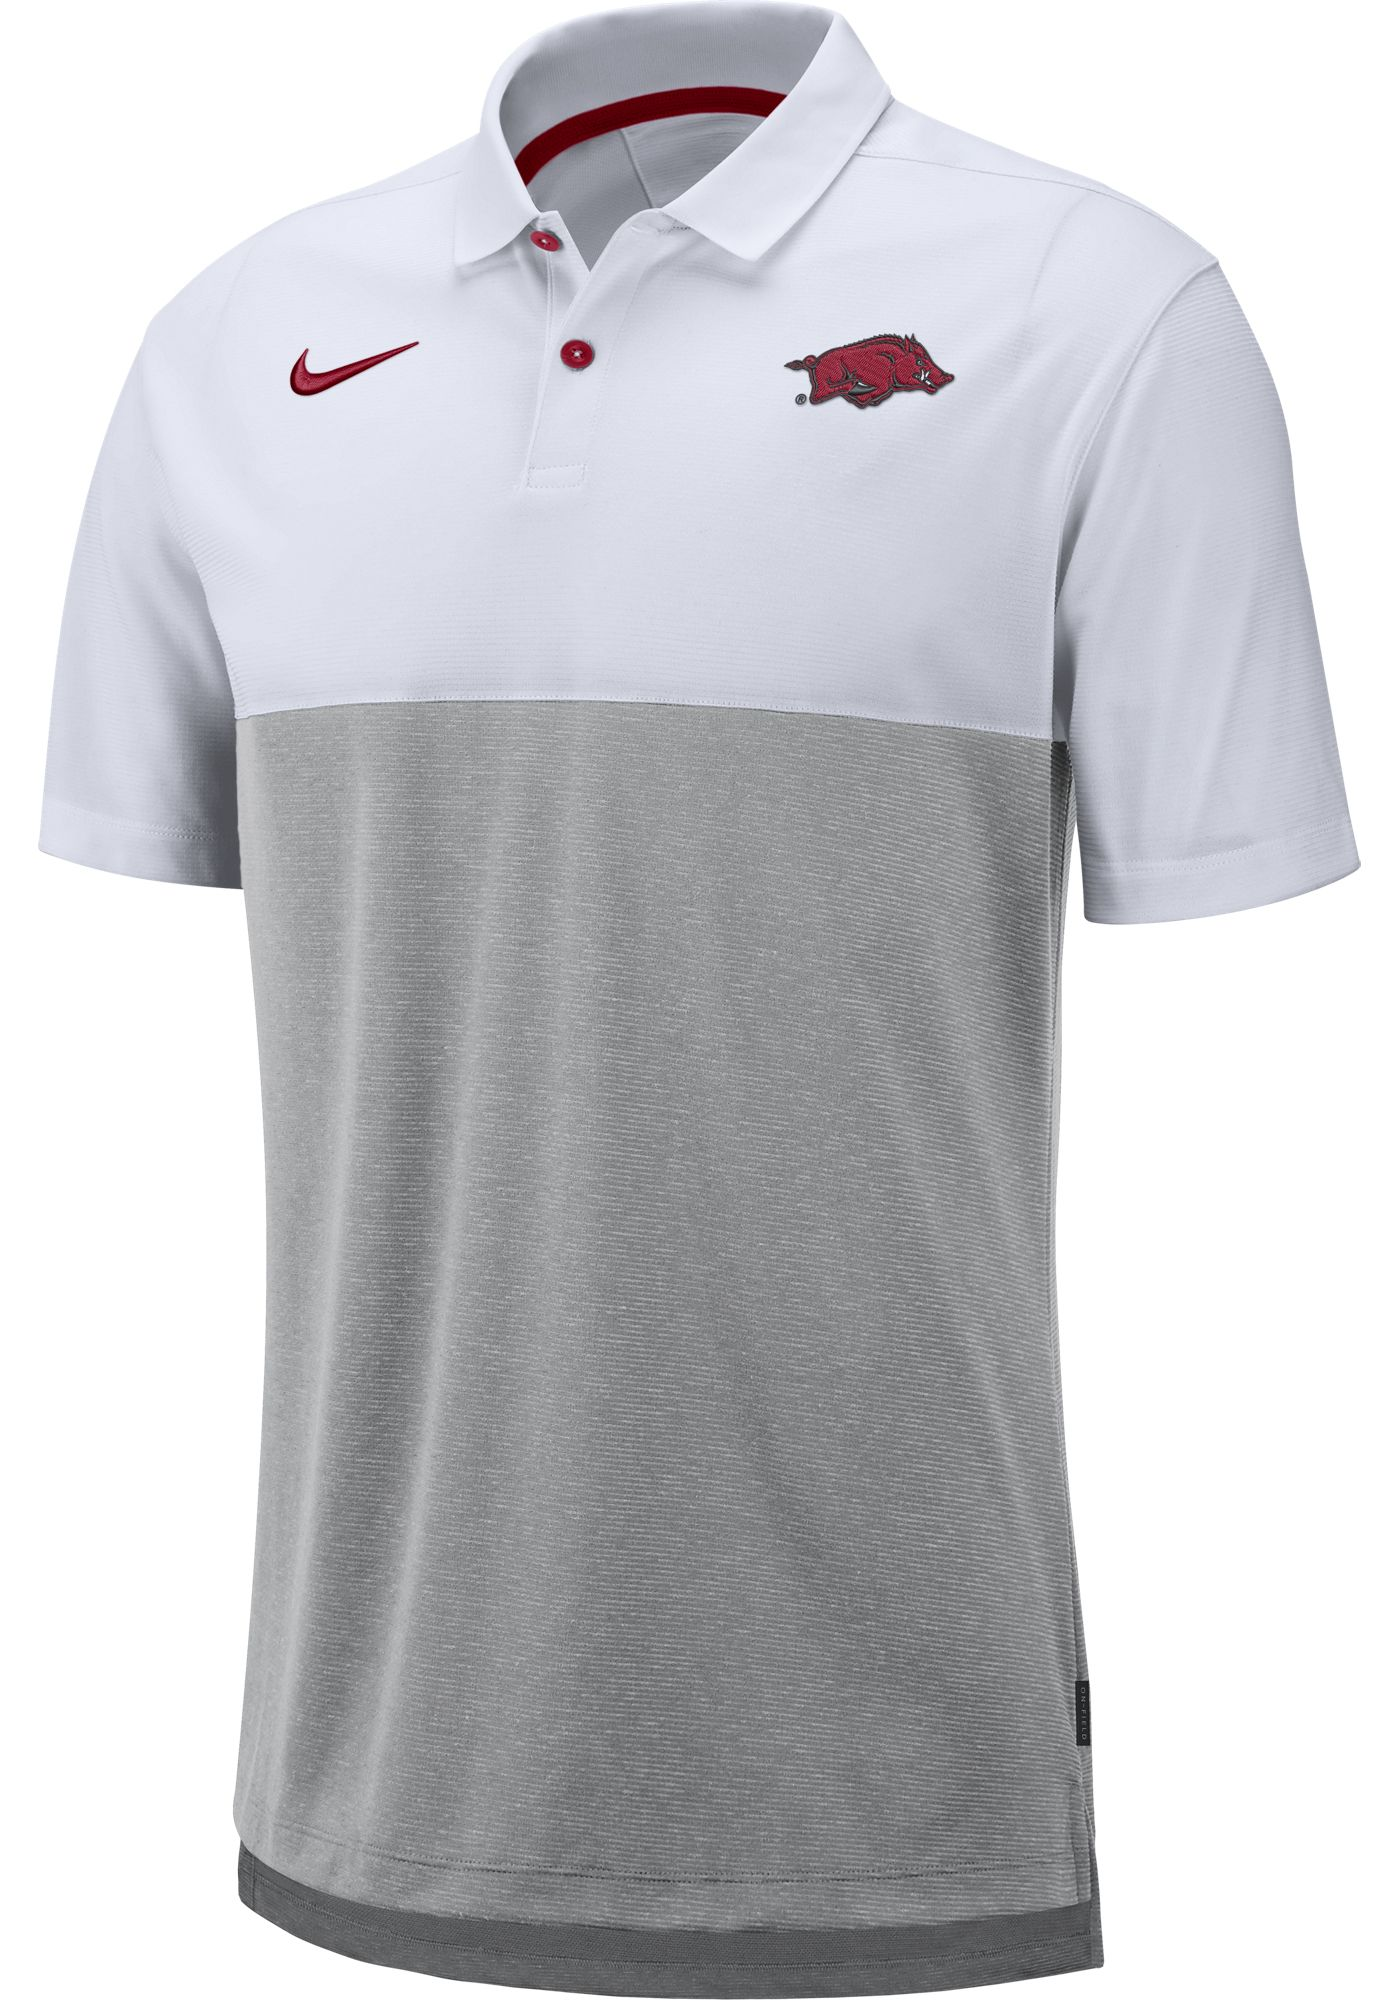 Nike Men's Arkansas Razorbacks White/Grey Dri-FIT Breathe Football Sideline Polo